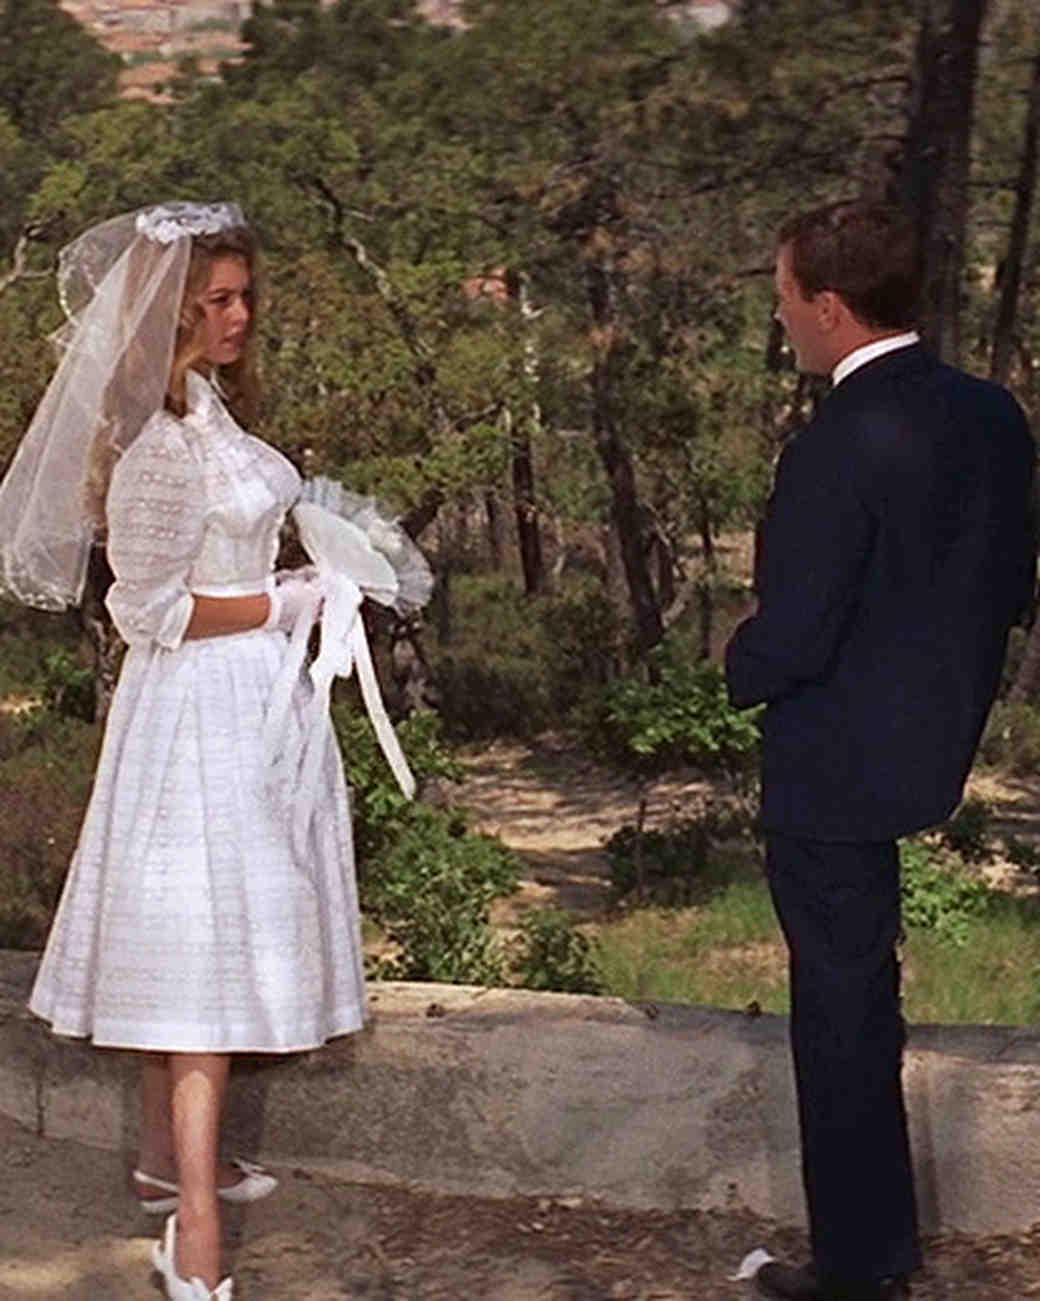 movie-wedding-dresses-and-god-created-woman-brigitte-bardot-shirtdress-0516.jpg